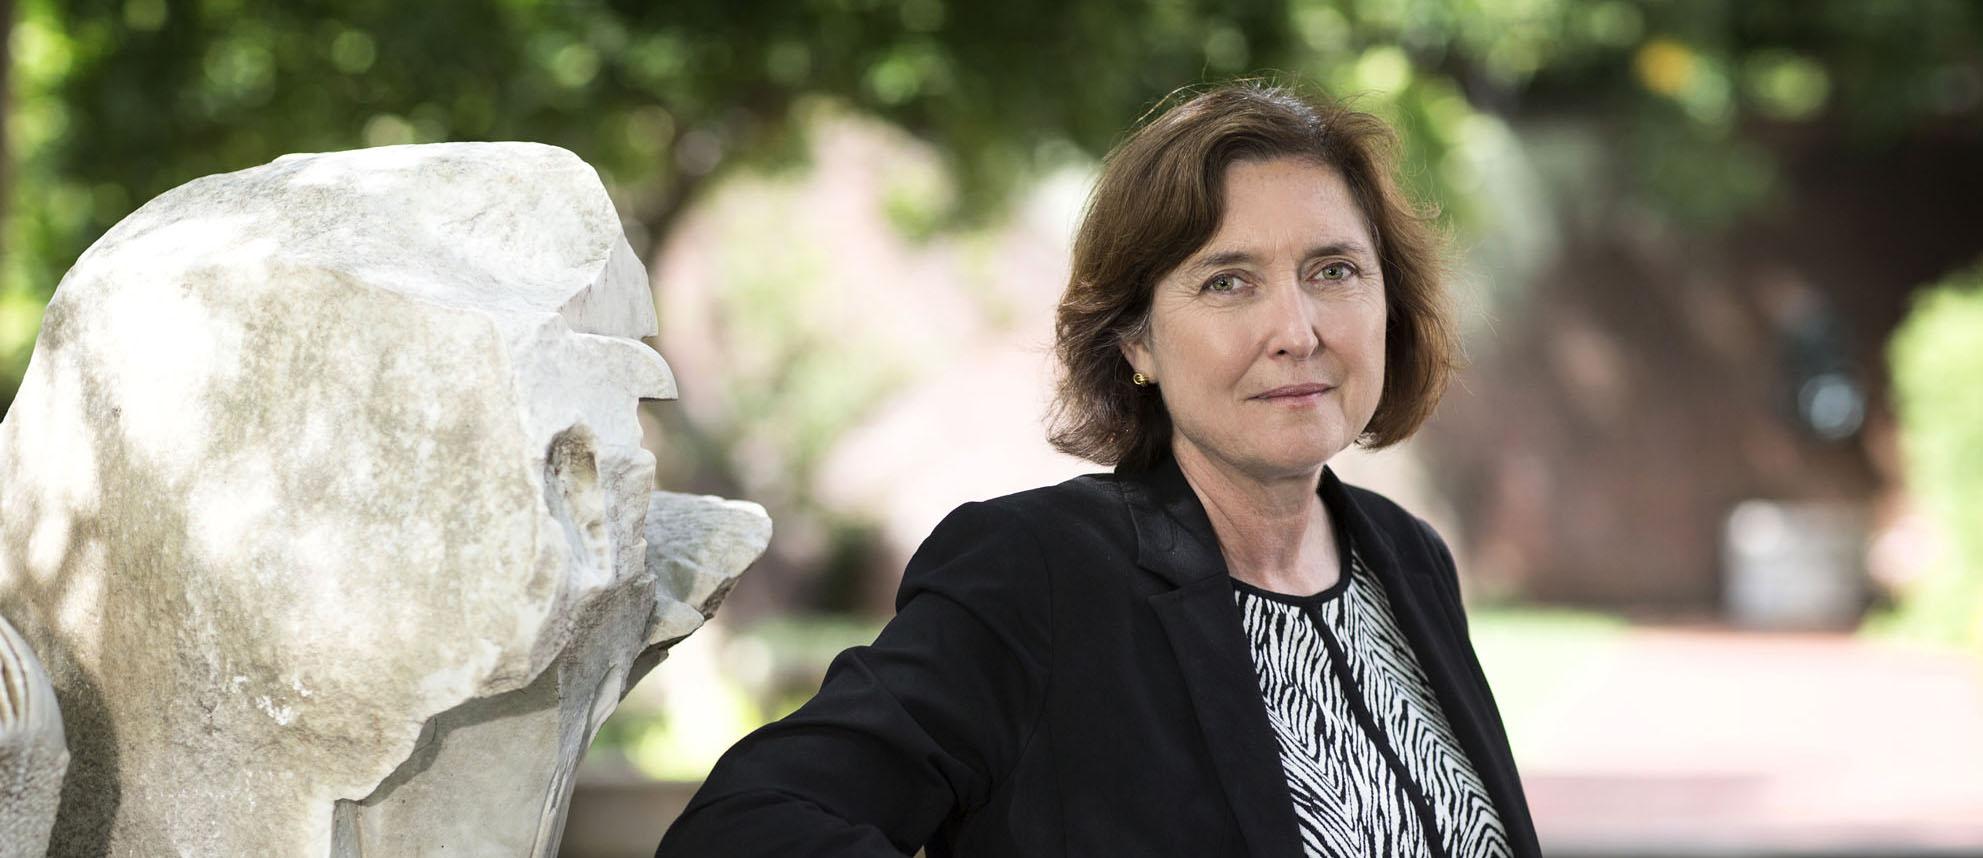 Curator Q&A: Lisa Reilly